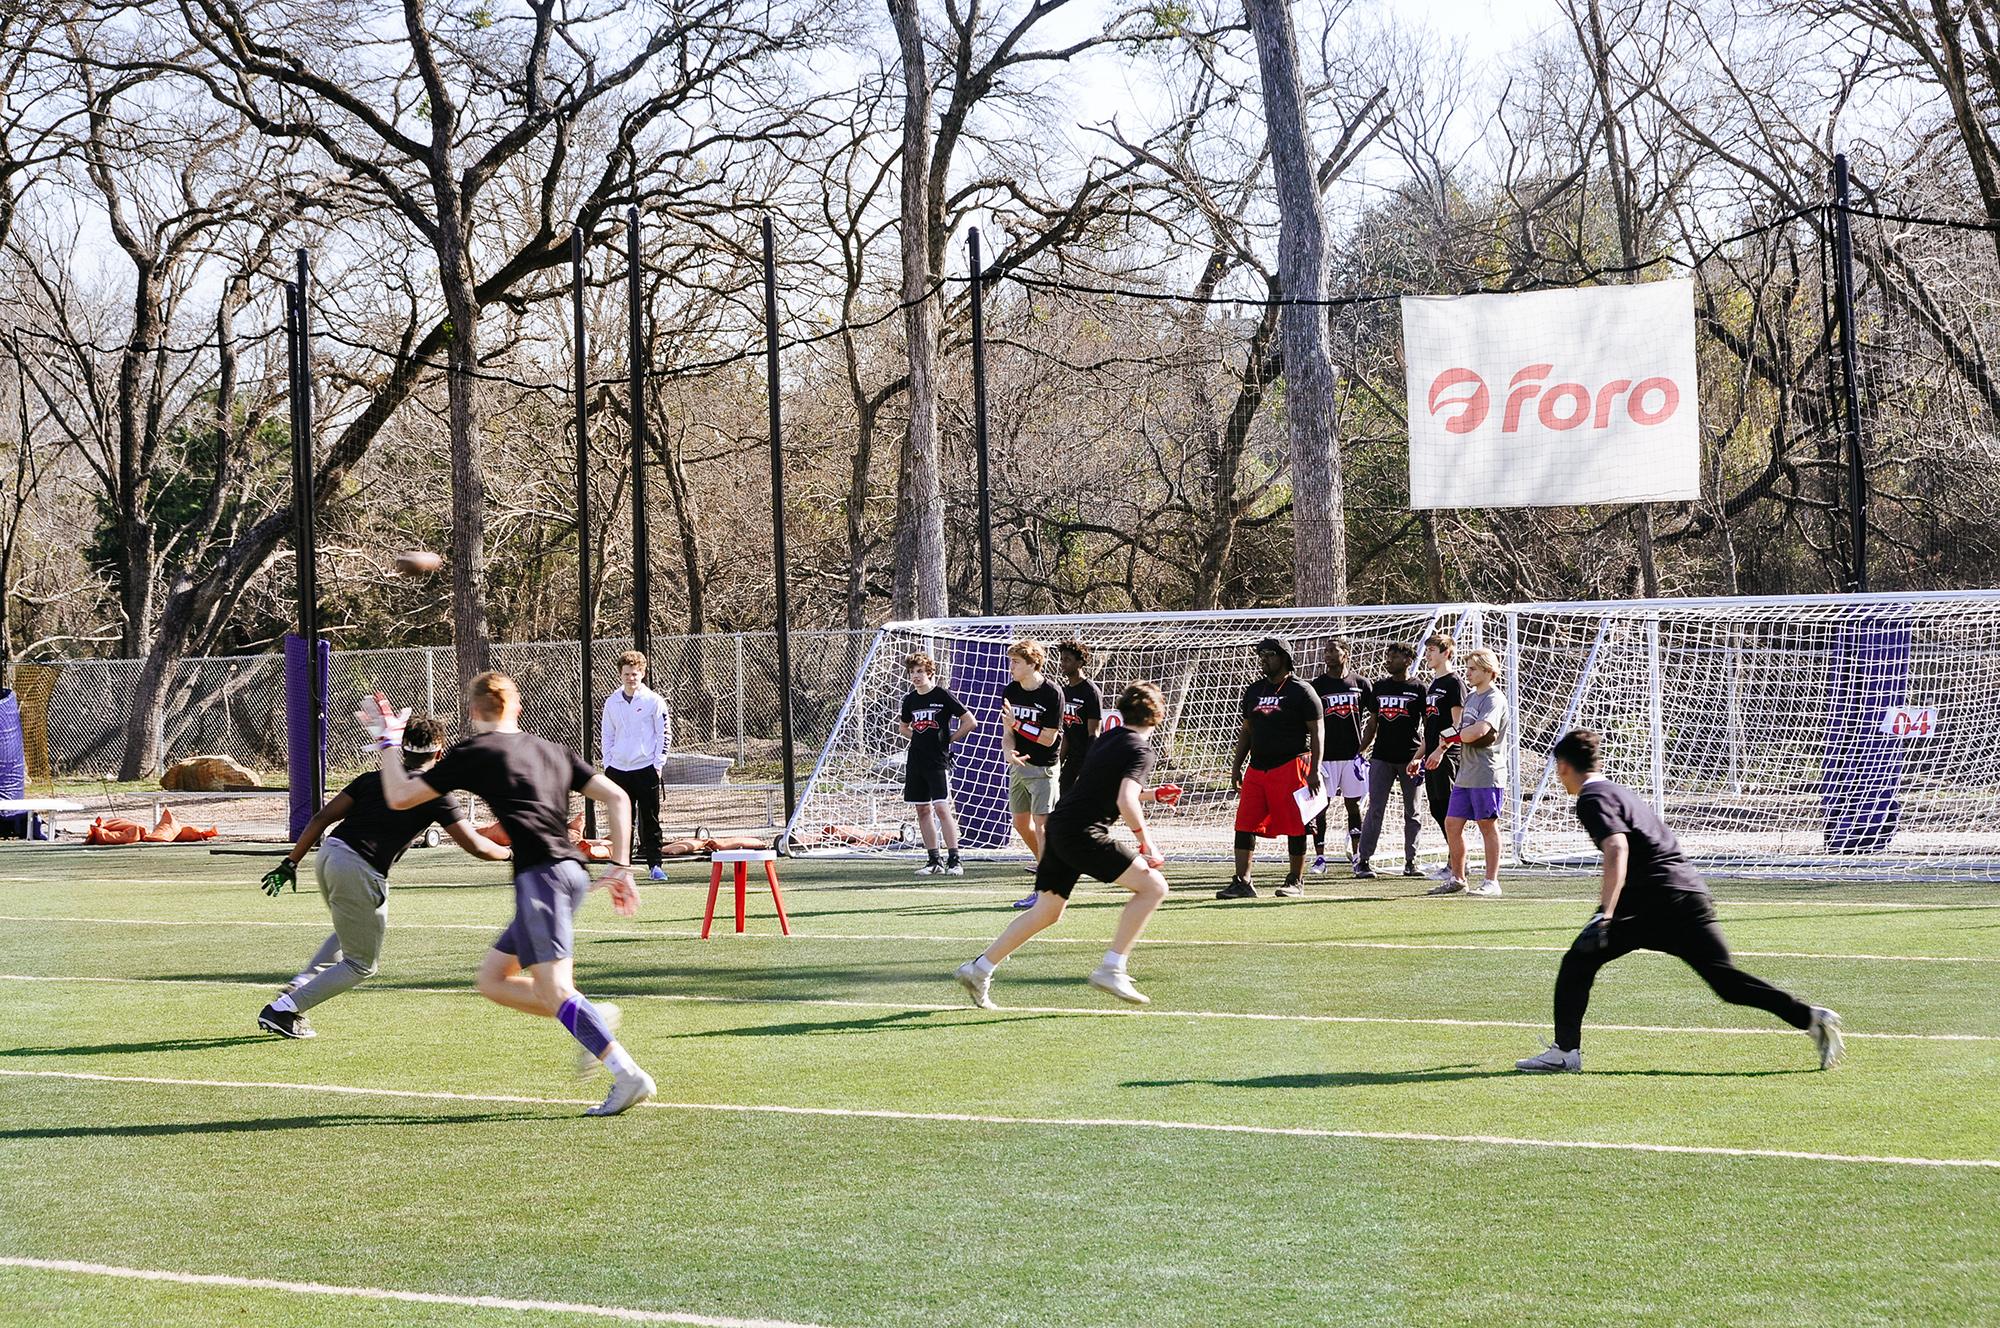 Photo courtesy of FORO Sports Club.